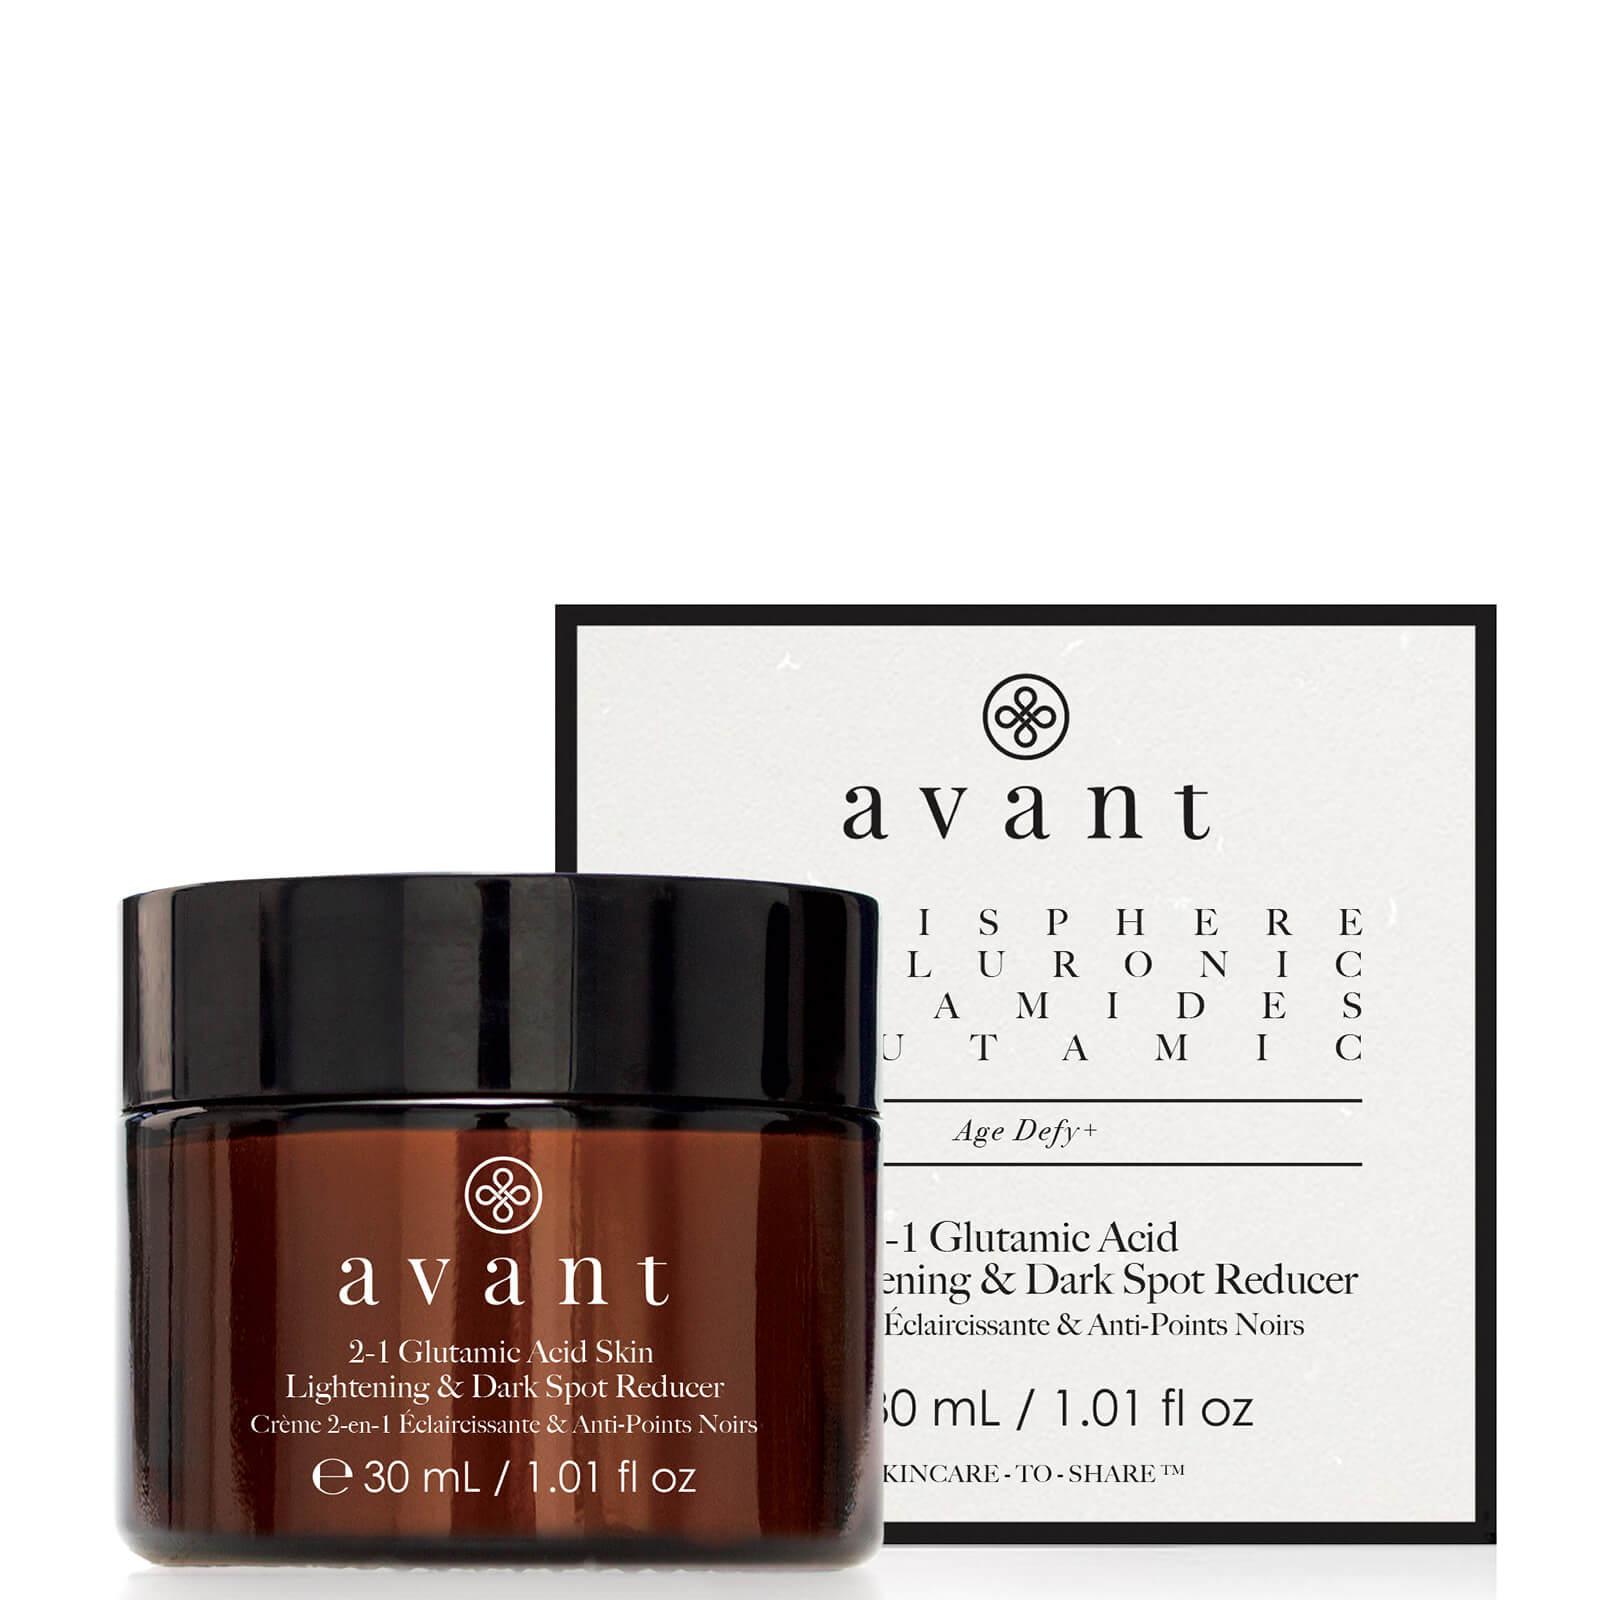 Купить Avant Skincare 2-1 Glutamic Skin Lightening and Dark Spot Reducer 30ml